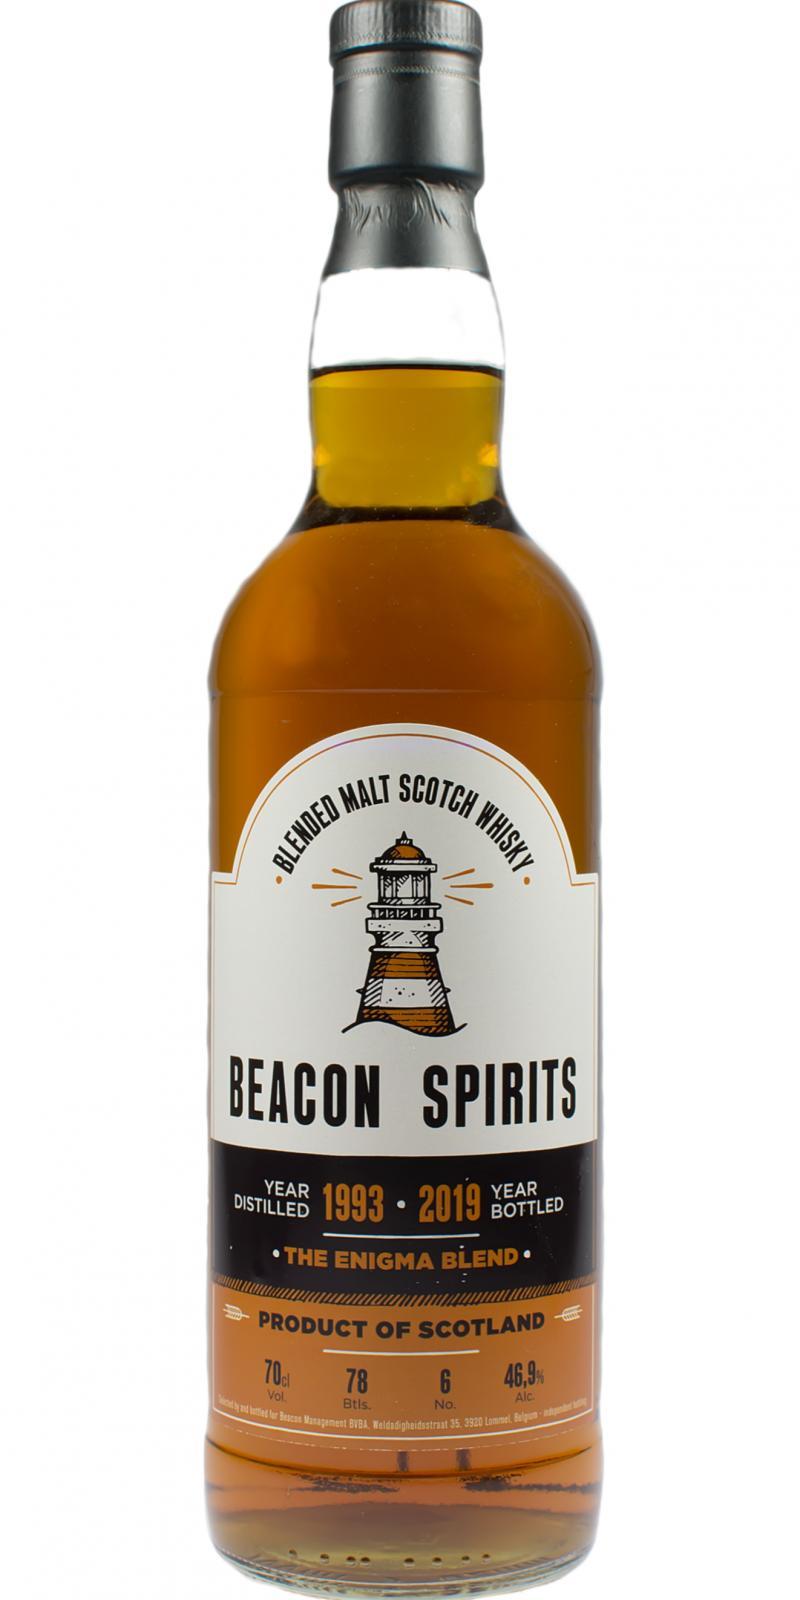 Blended Malt Scotch Whisky 1993 BcS